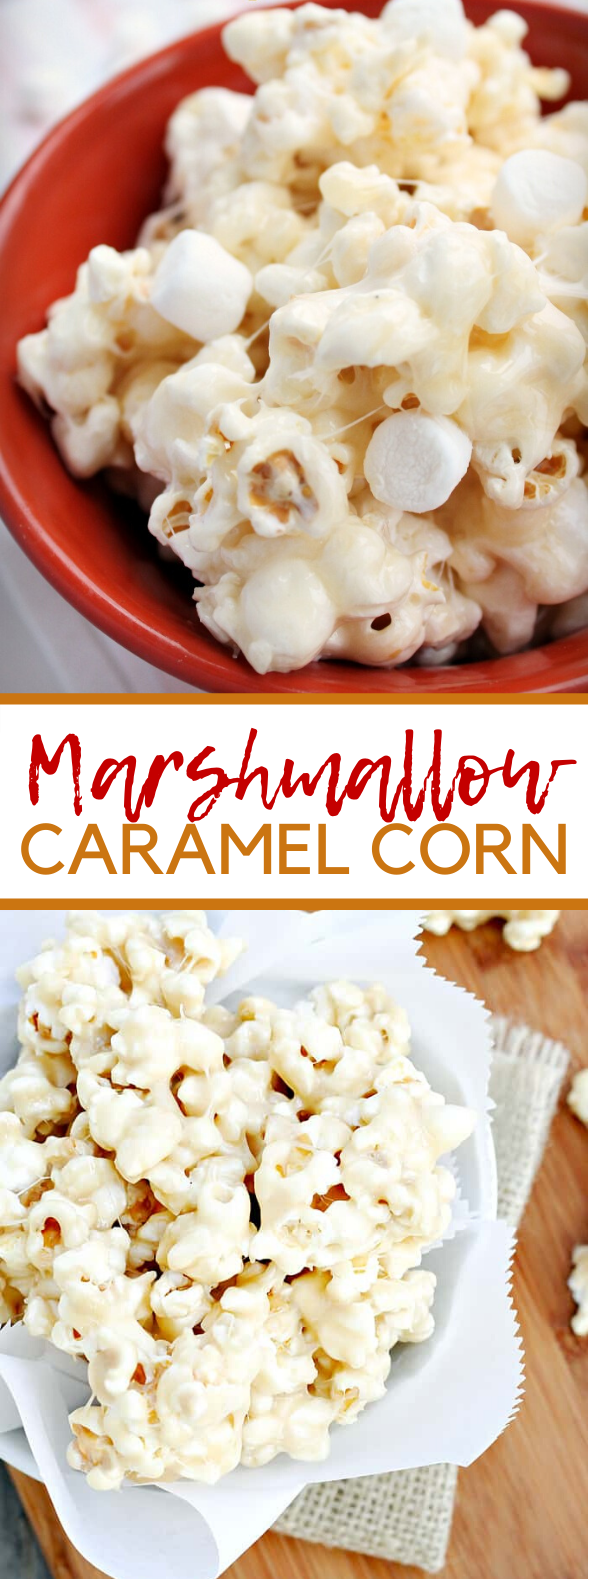 MARSHMALLOW CARAMEL CORN #desserts #sweets